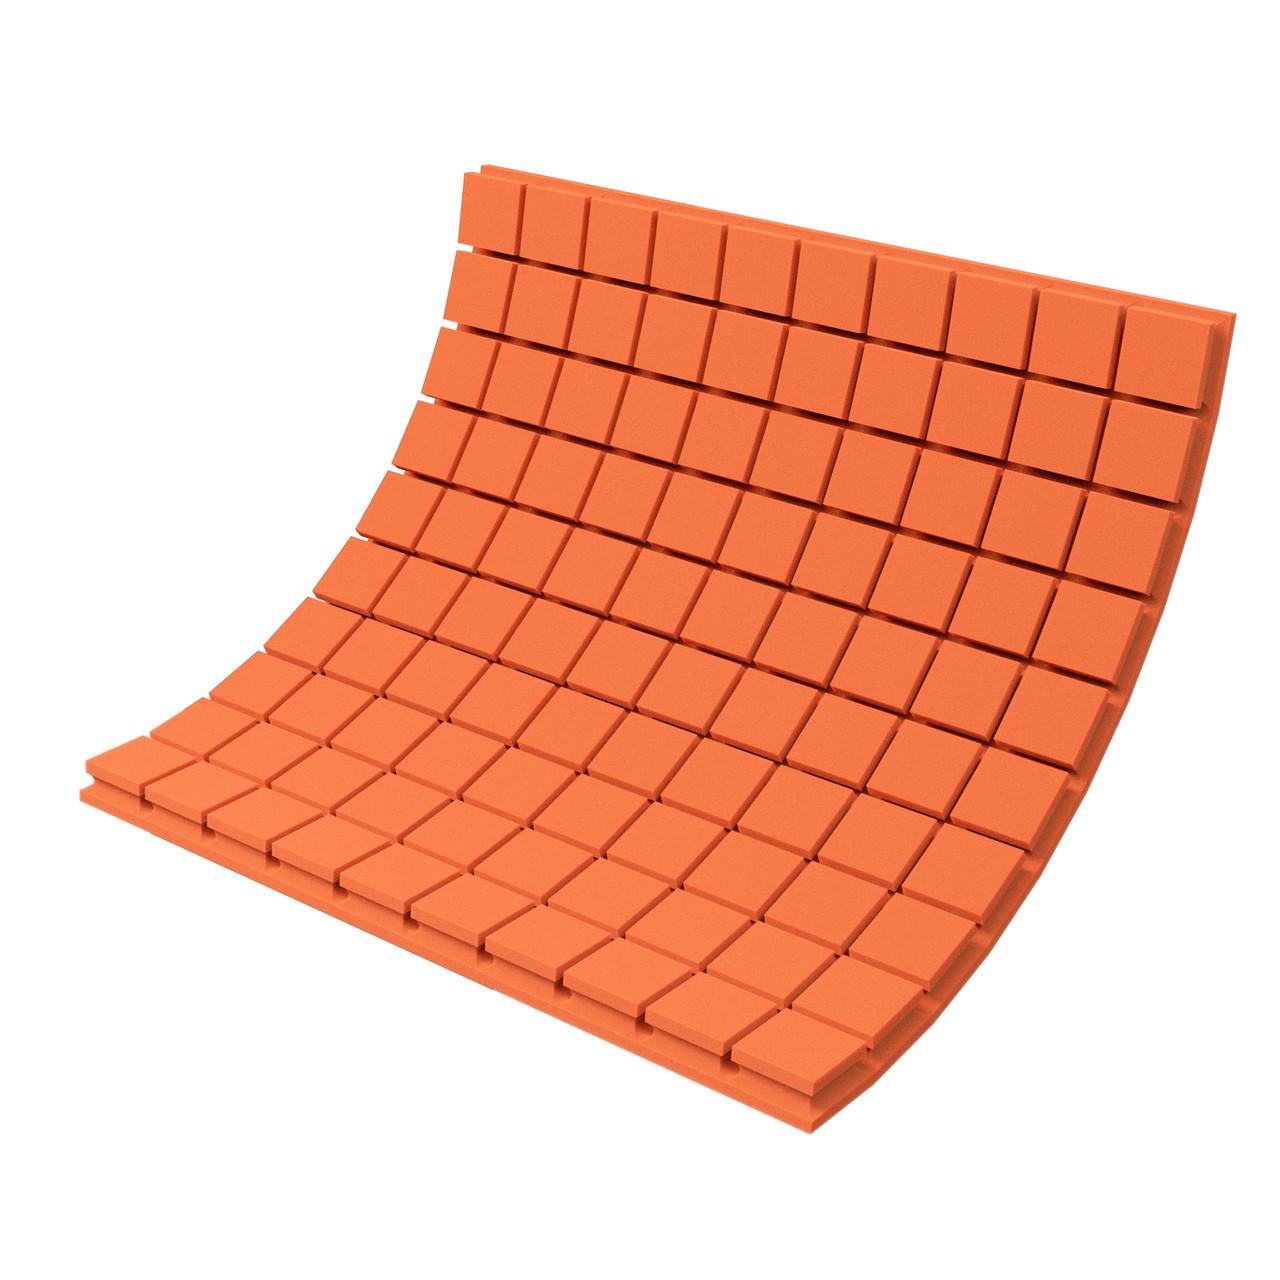 Панель з акустичного поролону Ecosound Tetras Color товщиною 70 мм, розміром 100х100 см, оранжевого кольору